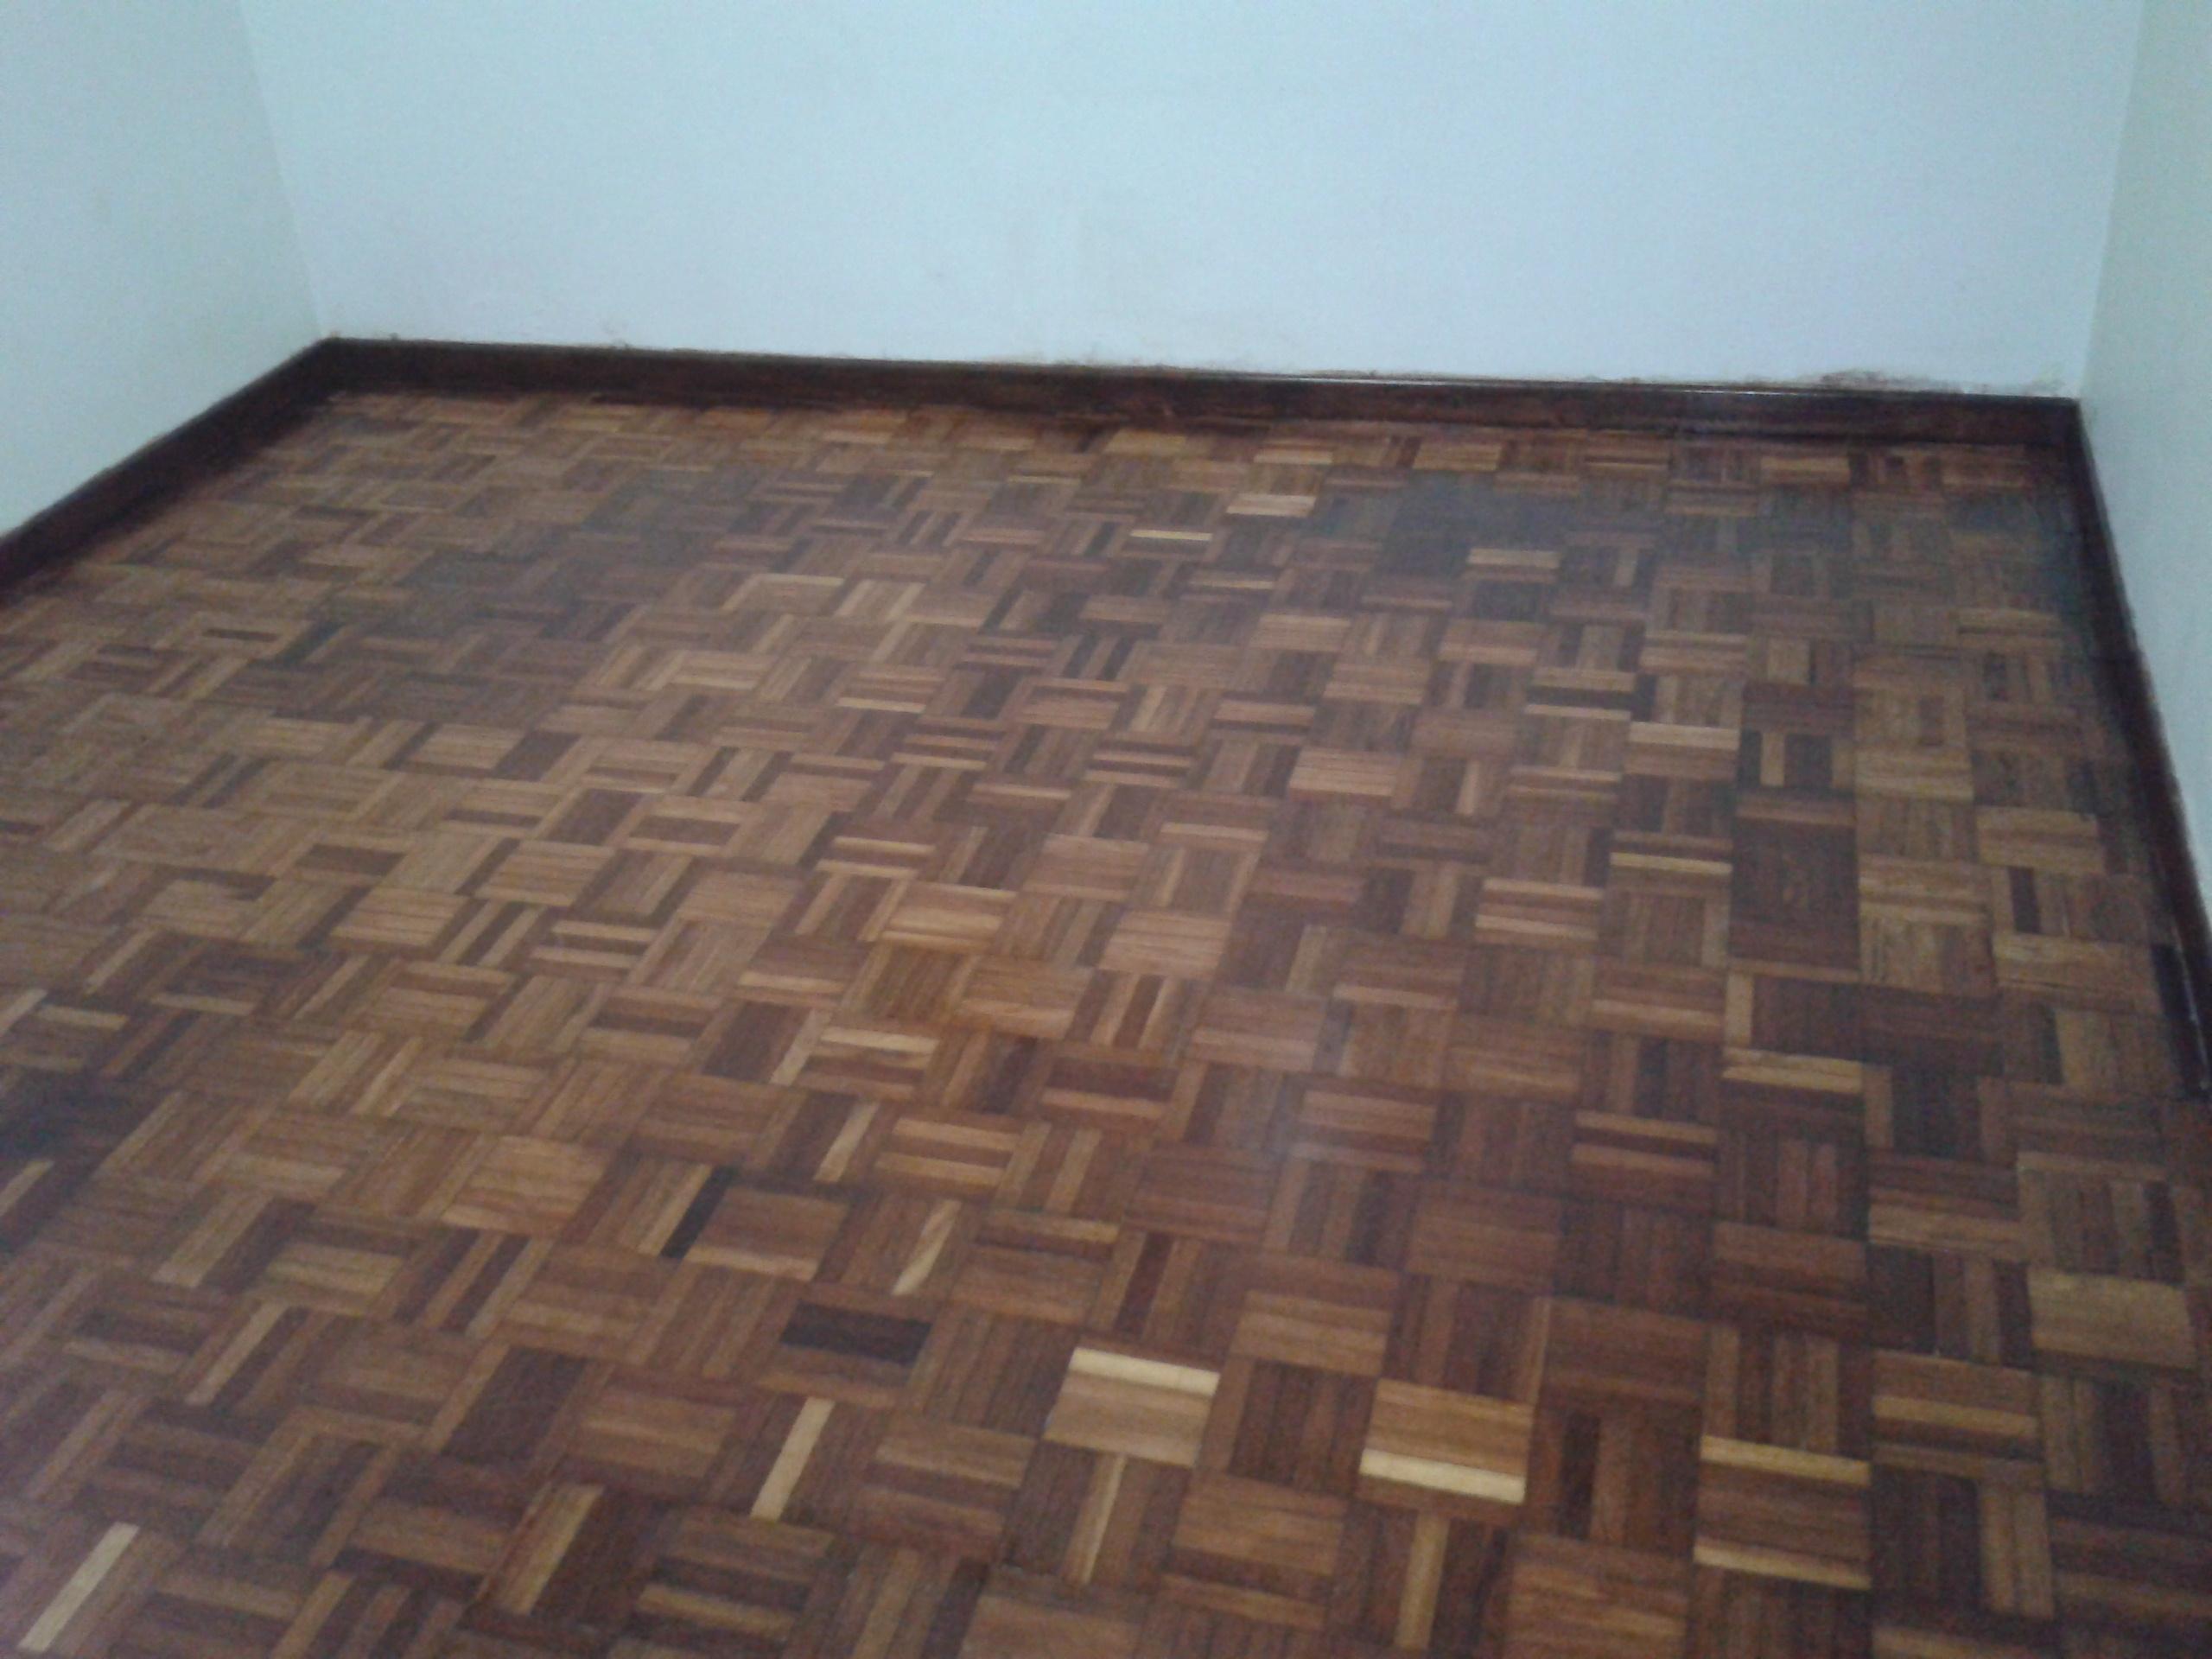 Paint for floor tiles